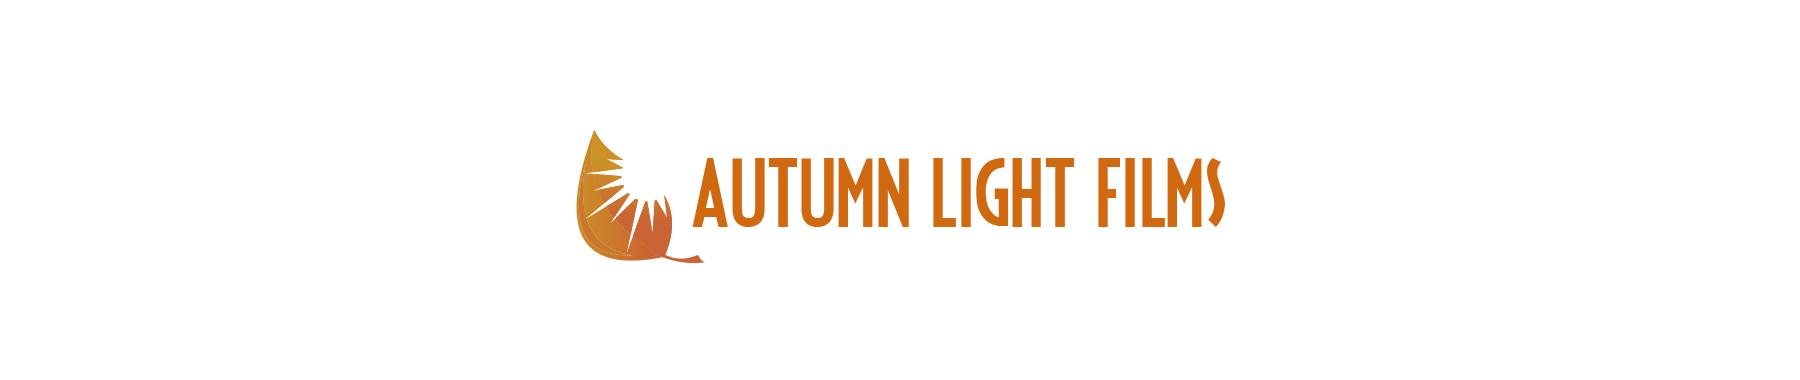 autumn light films.jpg